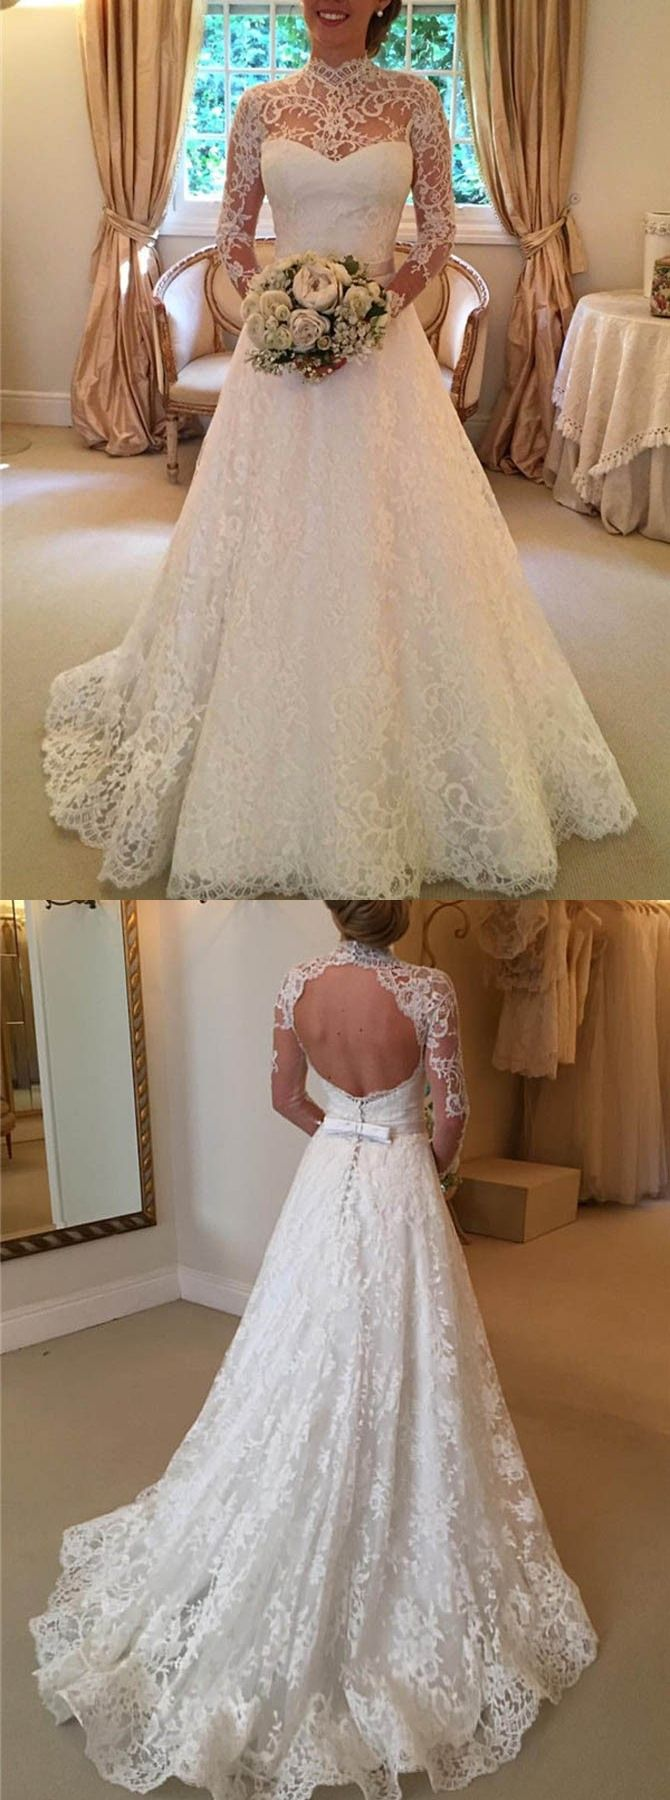 A-line Wedding Dress,Lace Wedding Dress,Open Back Wedding Dress,Long Sleeves Wedding Dress,Bow knot Wedding Dress,Wedding Dress,Long Trains Wedding Dress,Wedding Dresses,2017 Wedding Dress,2017 Wedding Dresses